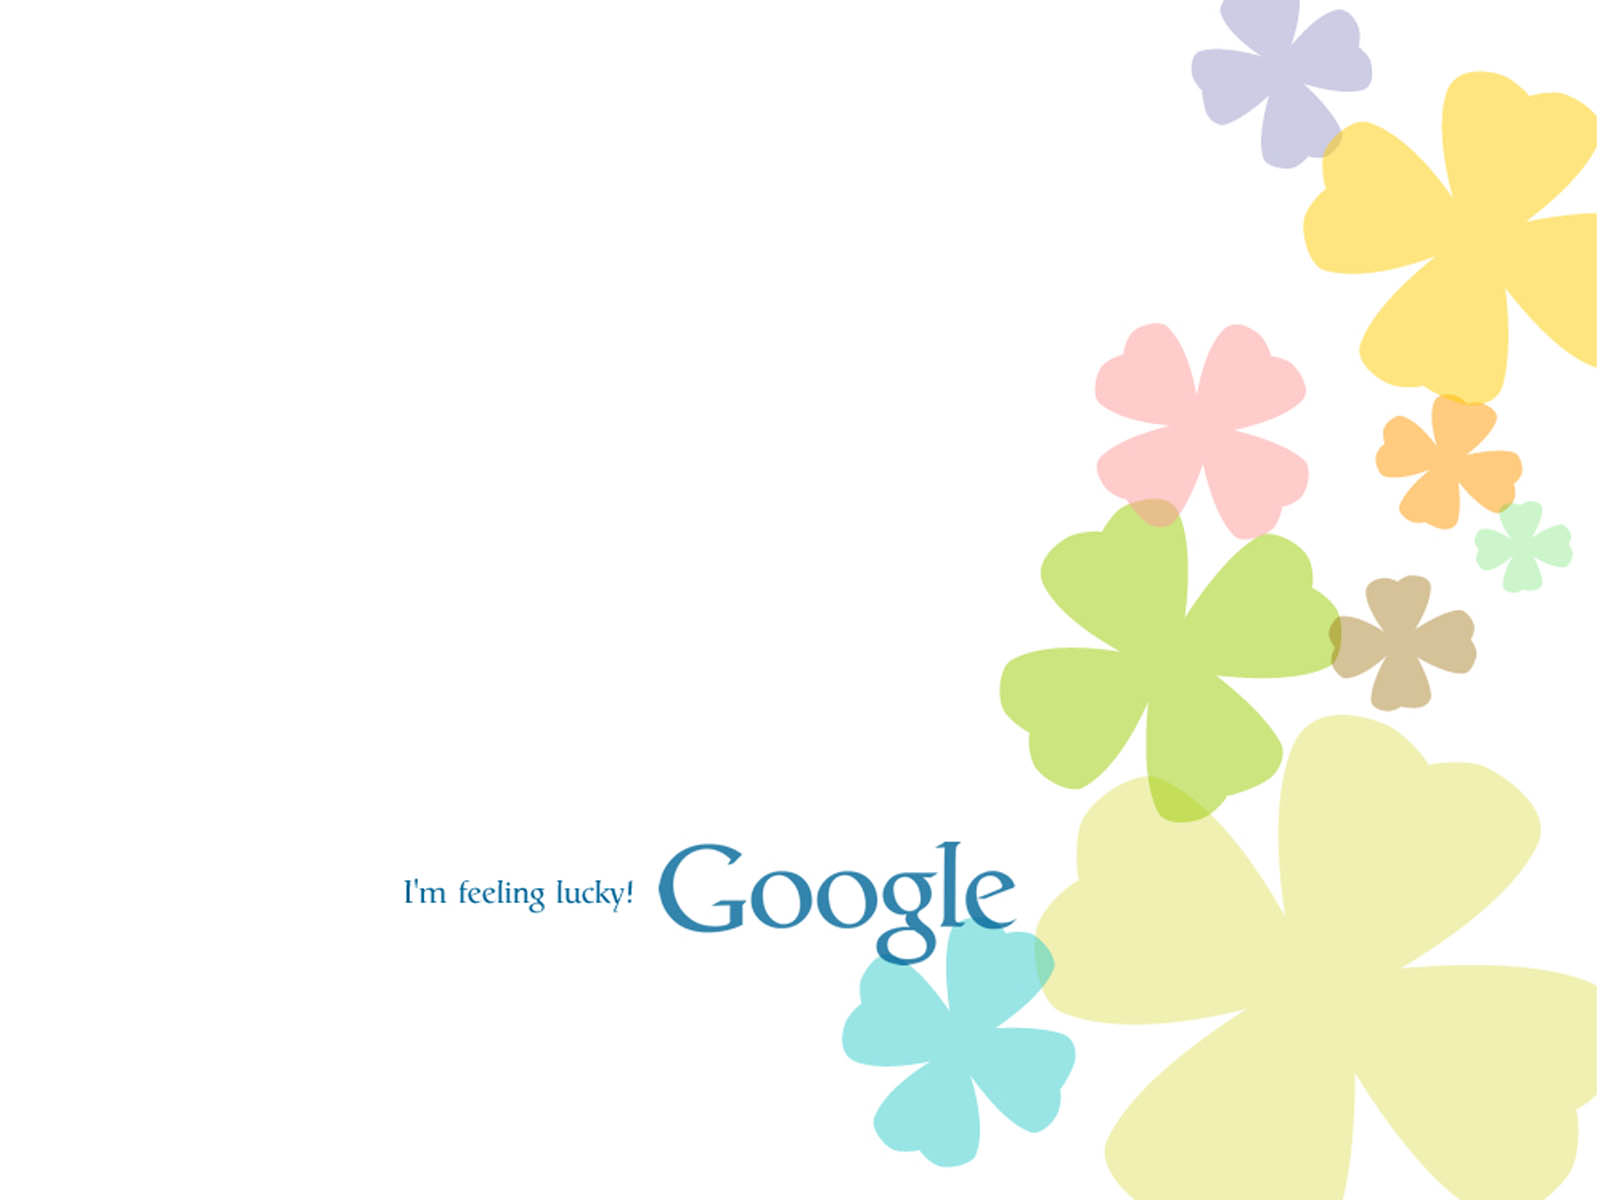 Google Desktop Backgrounds Google Photos Google Pictures Images 1600x1200